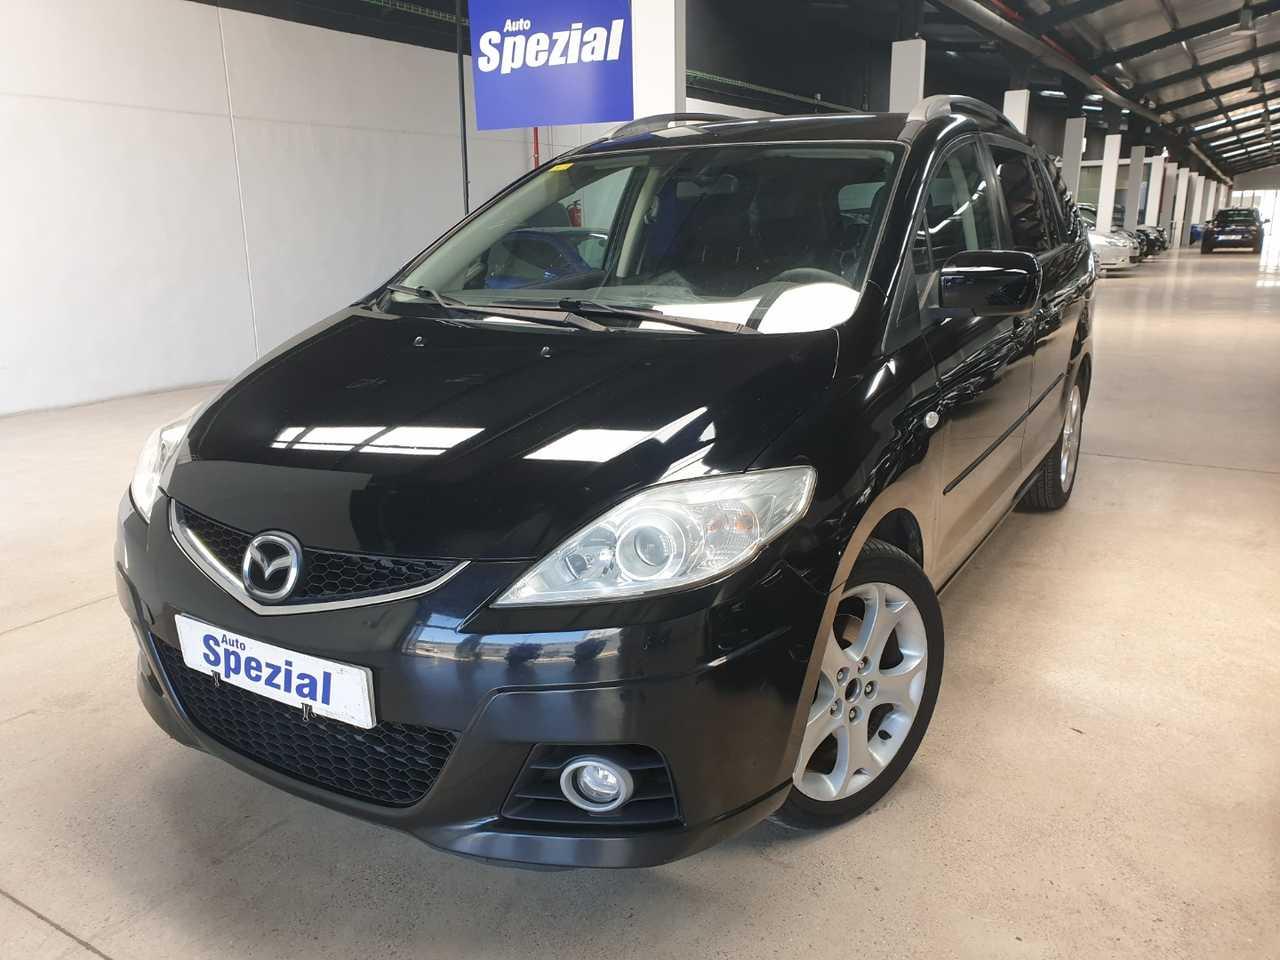 Mazda 5 2.0 CDTR 143 CV 7 plazas  - Foto 1